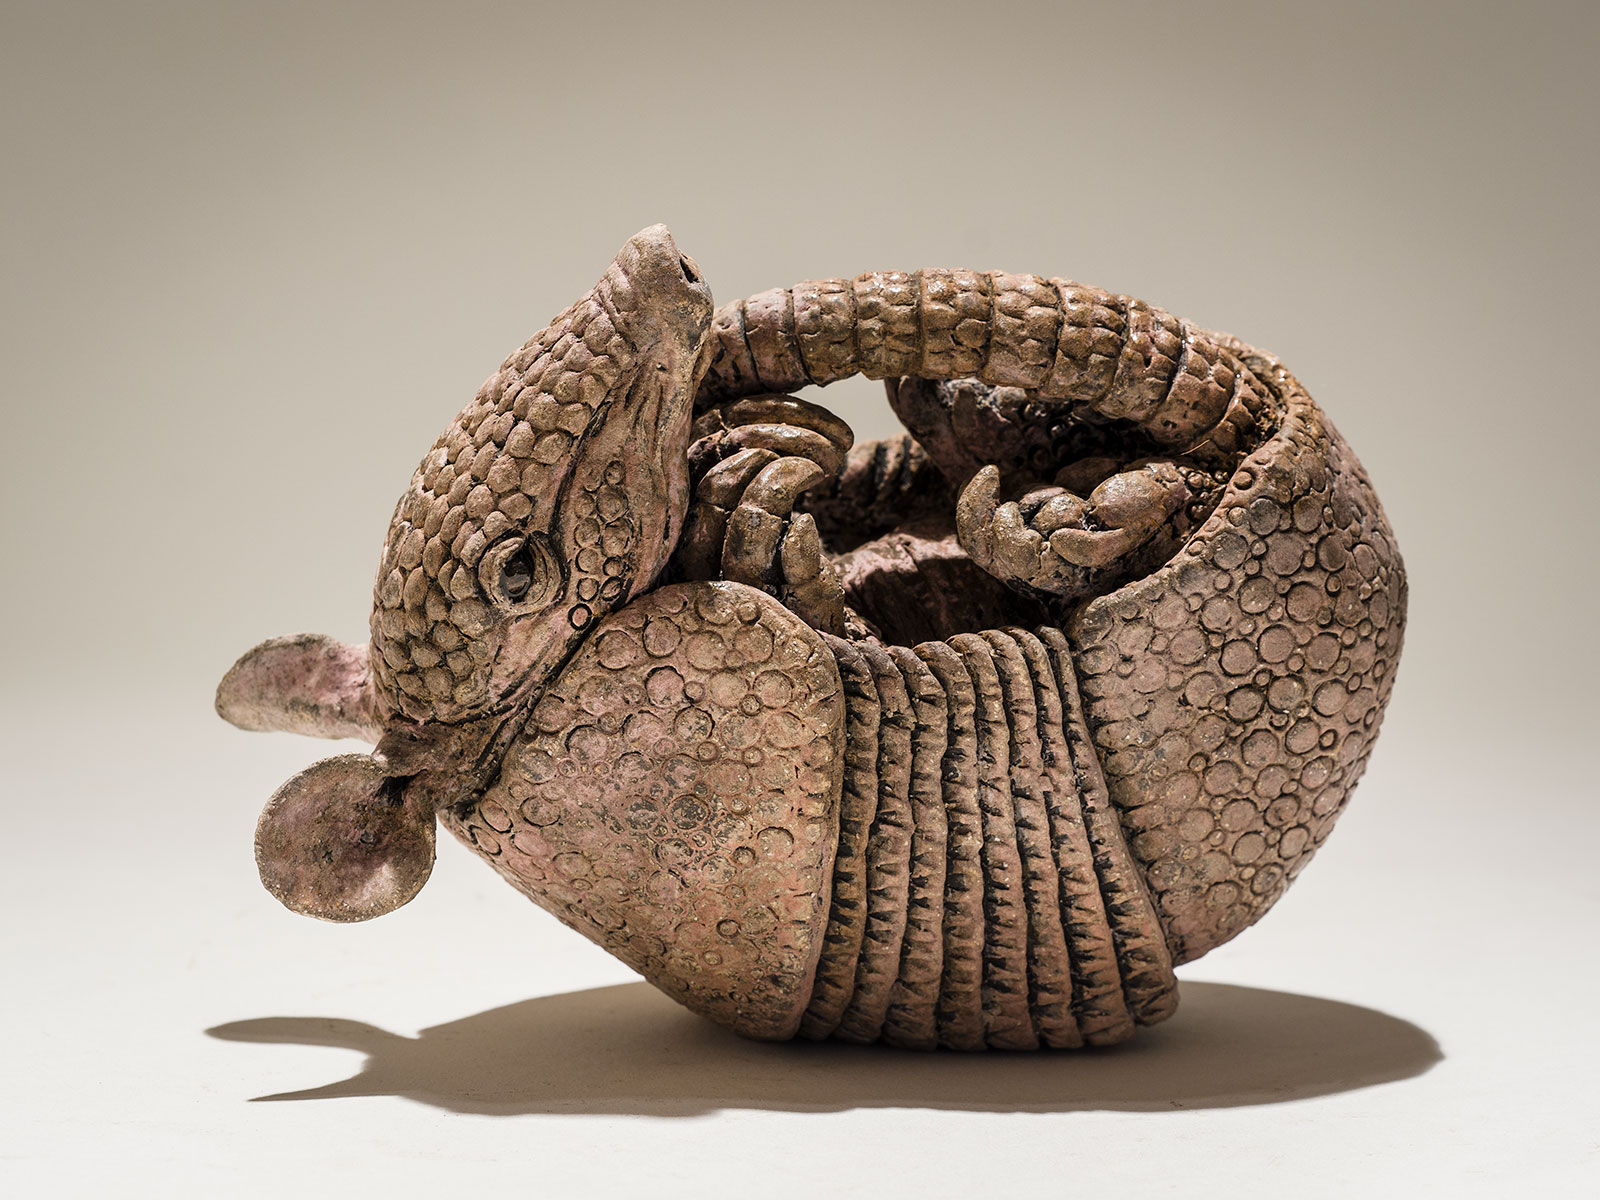 Armadillo Sculpture